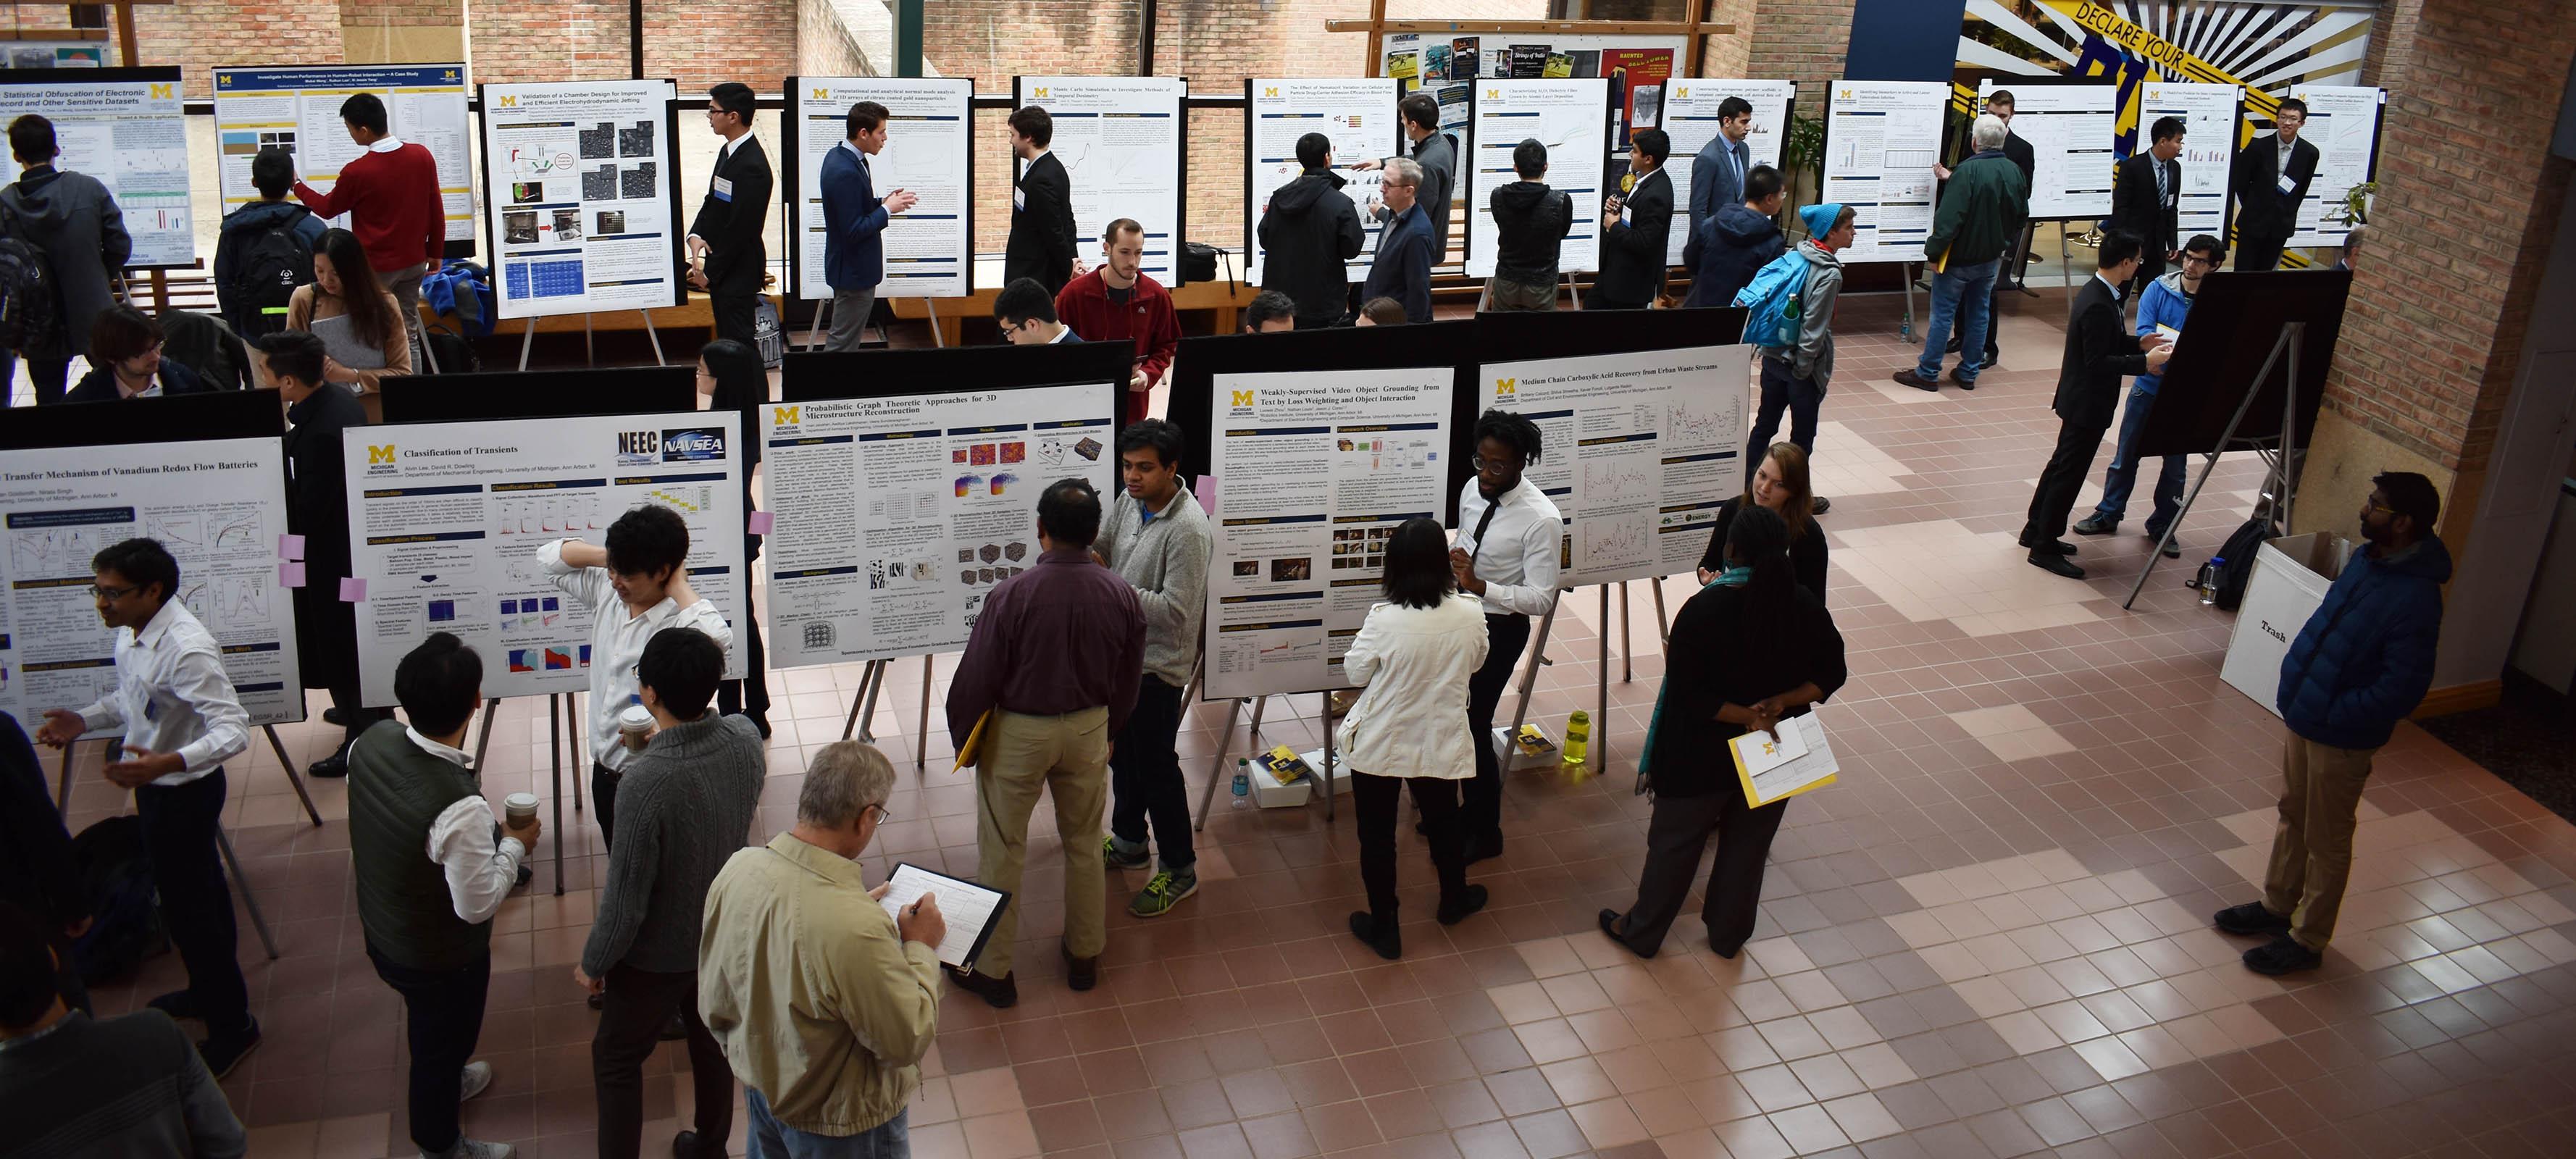 2018 Engineering Symposium